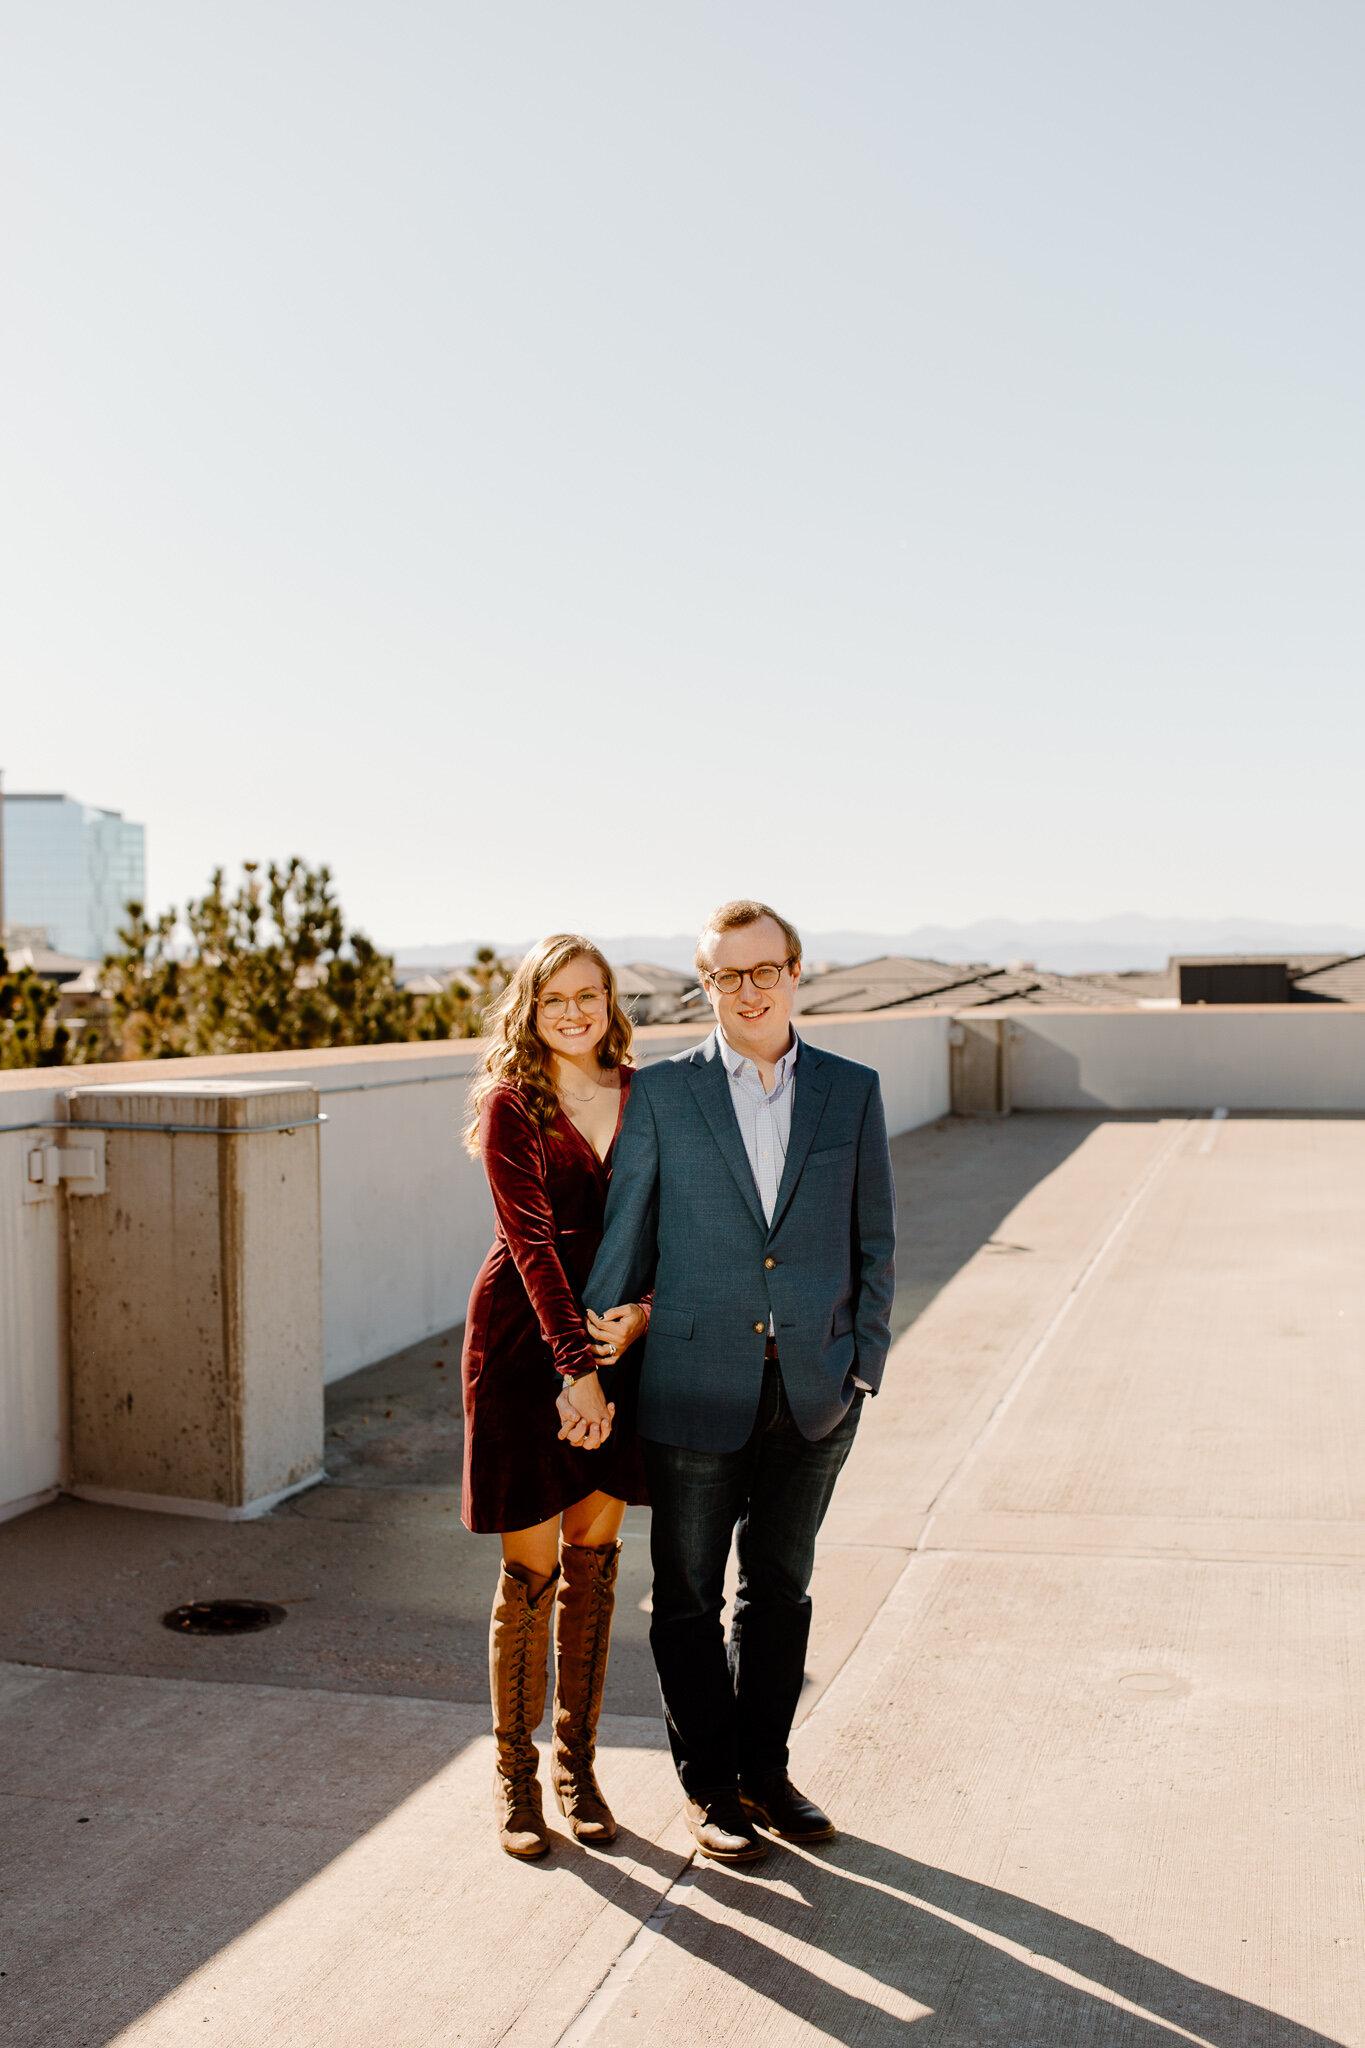 denver rooftop engagement photos